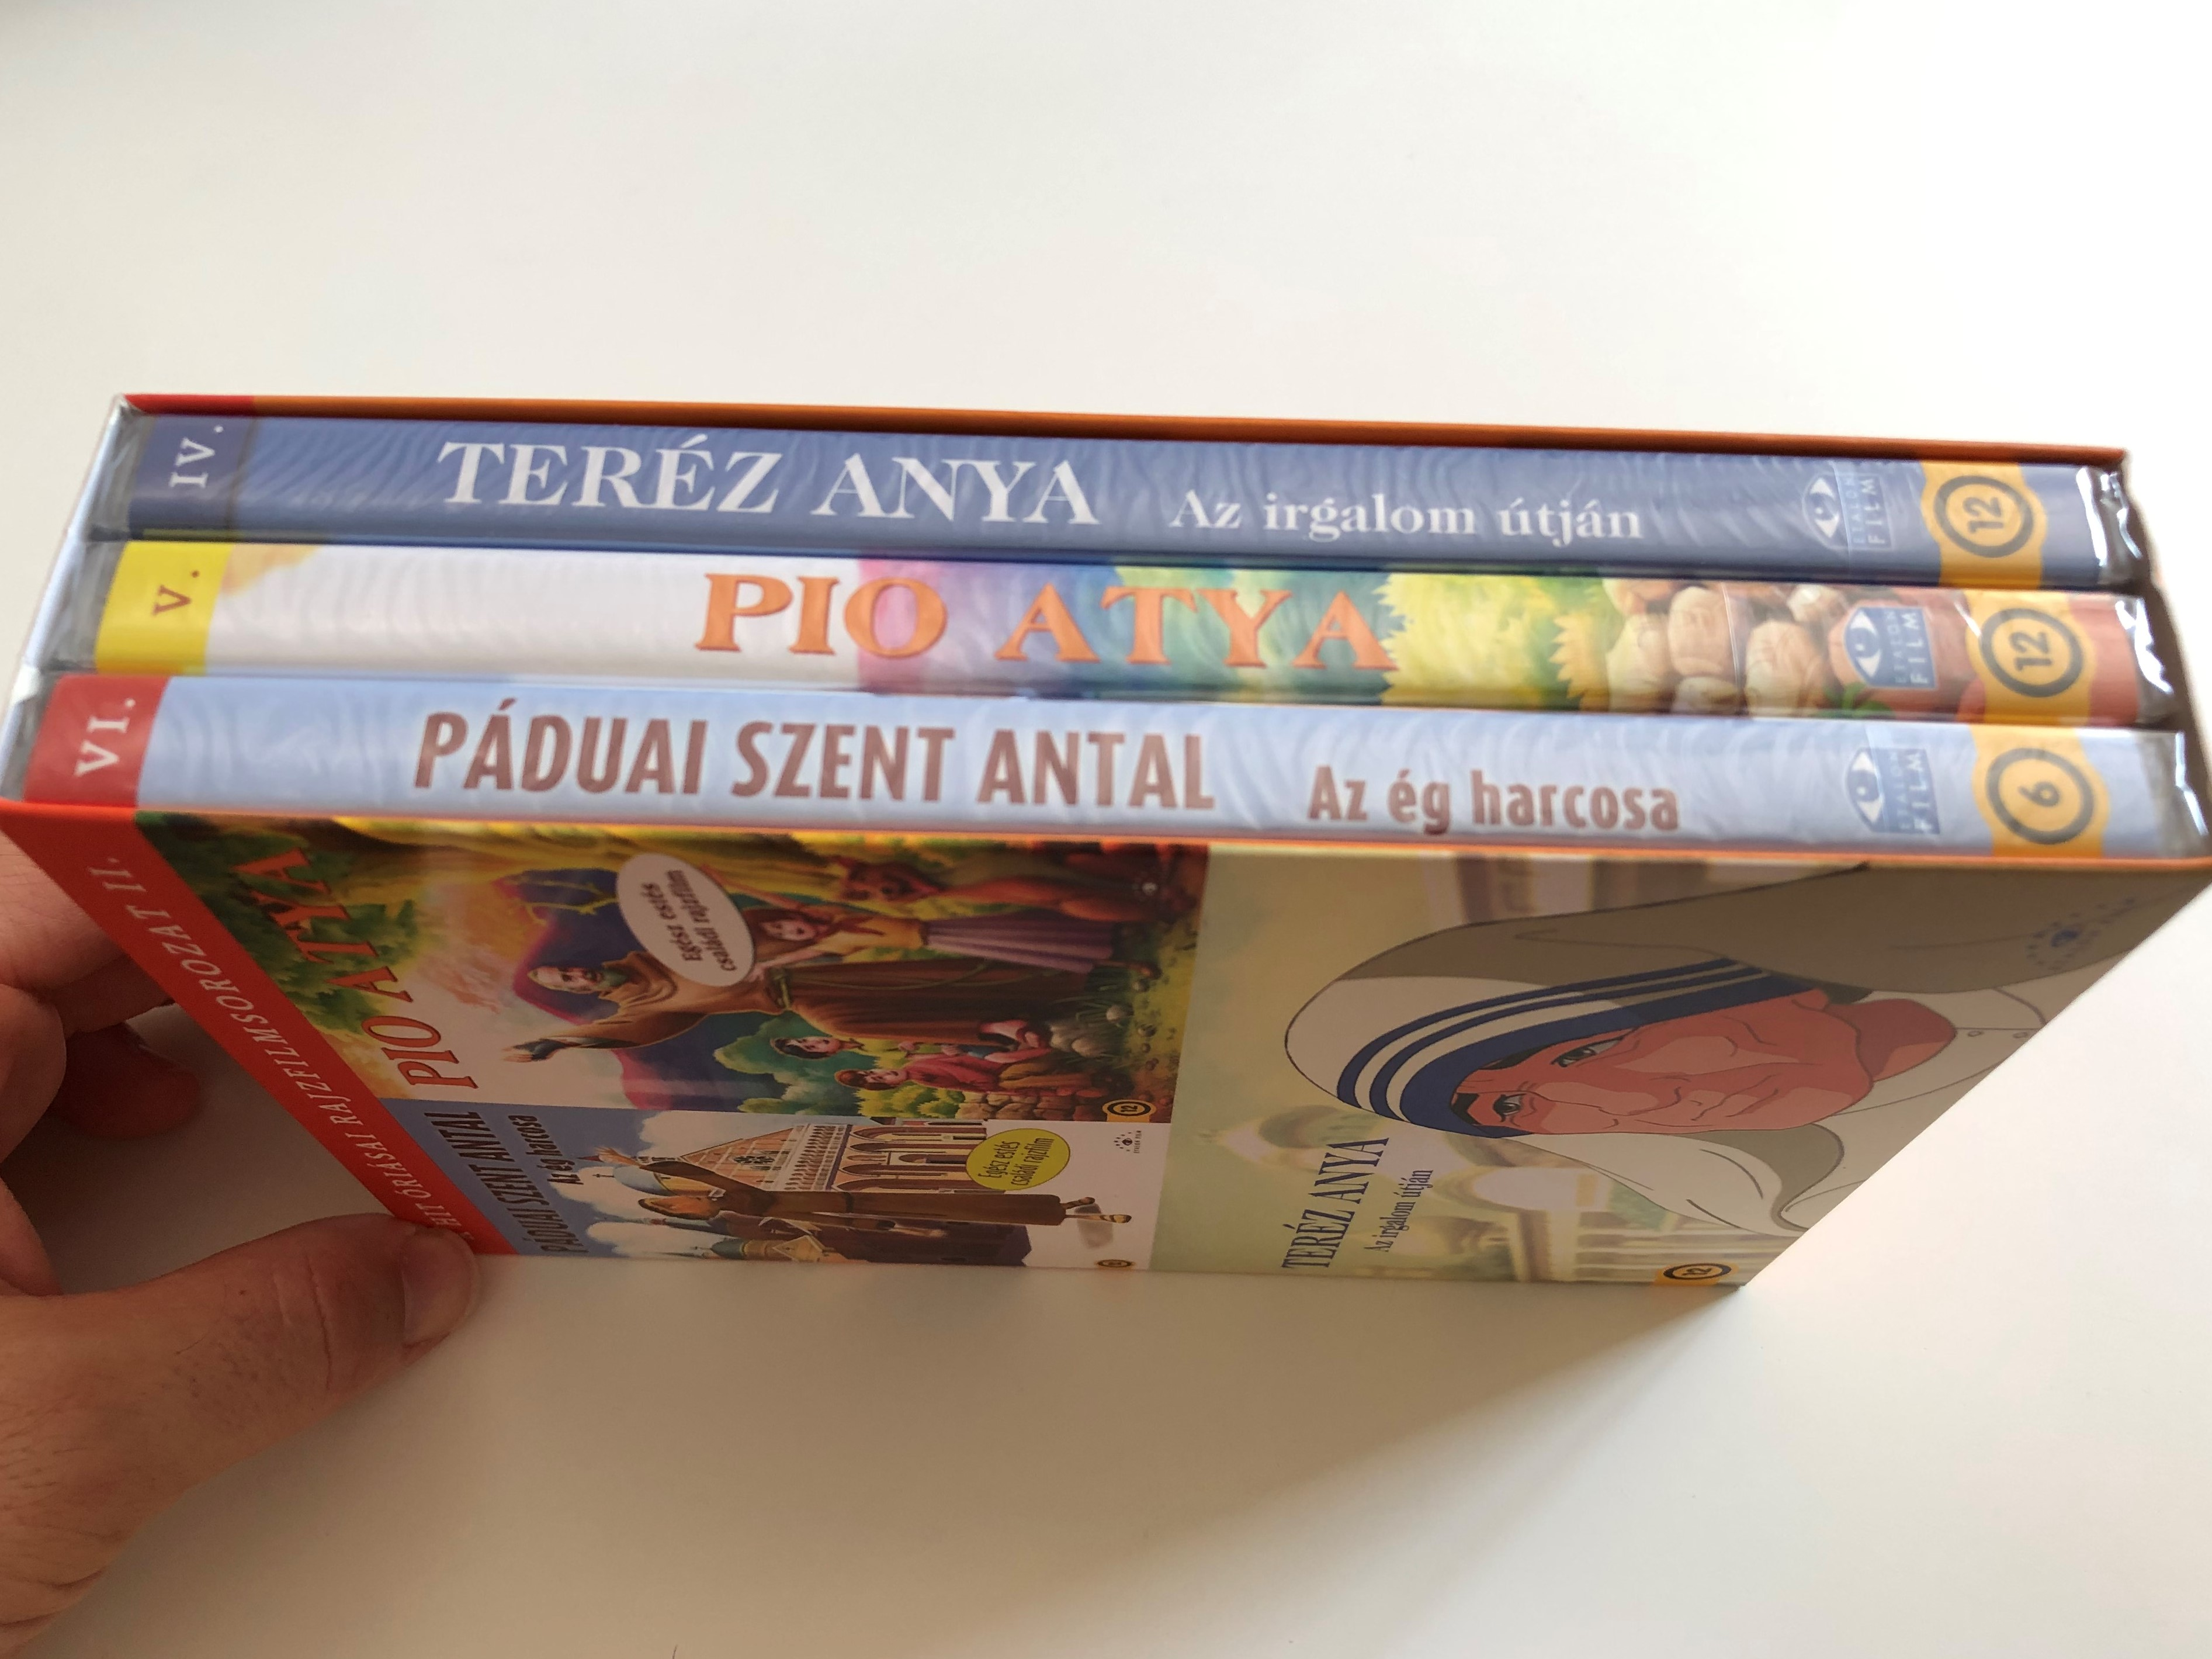 p-duai-szent-antal-pio-atya-ter-z-anya-dvd-a-hit-ri-sai-rajzfilmsorozat-ii-3-disc-dvd-box-three-family-cartoons-synchronised-to-hungarian-language-6-.jpg